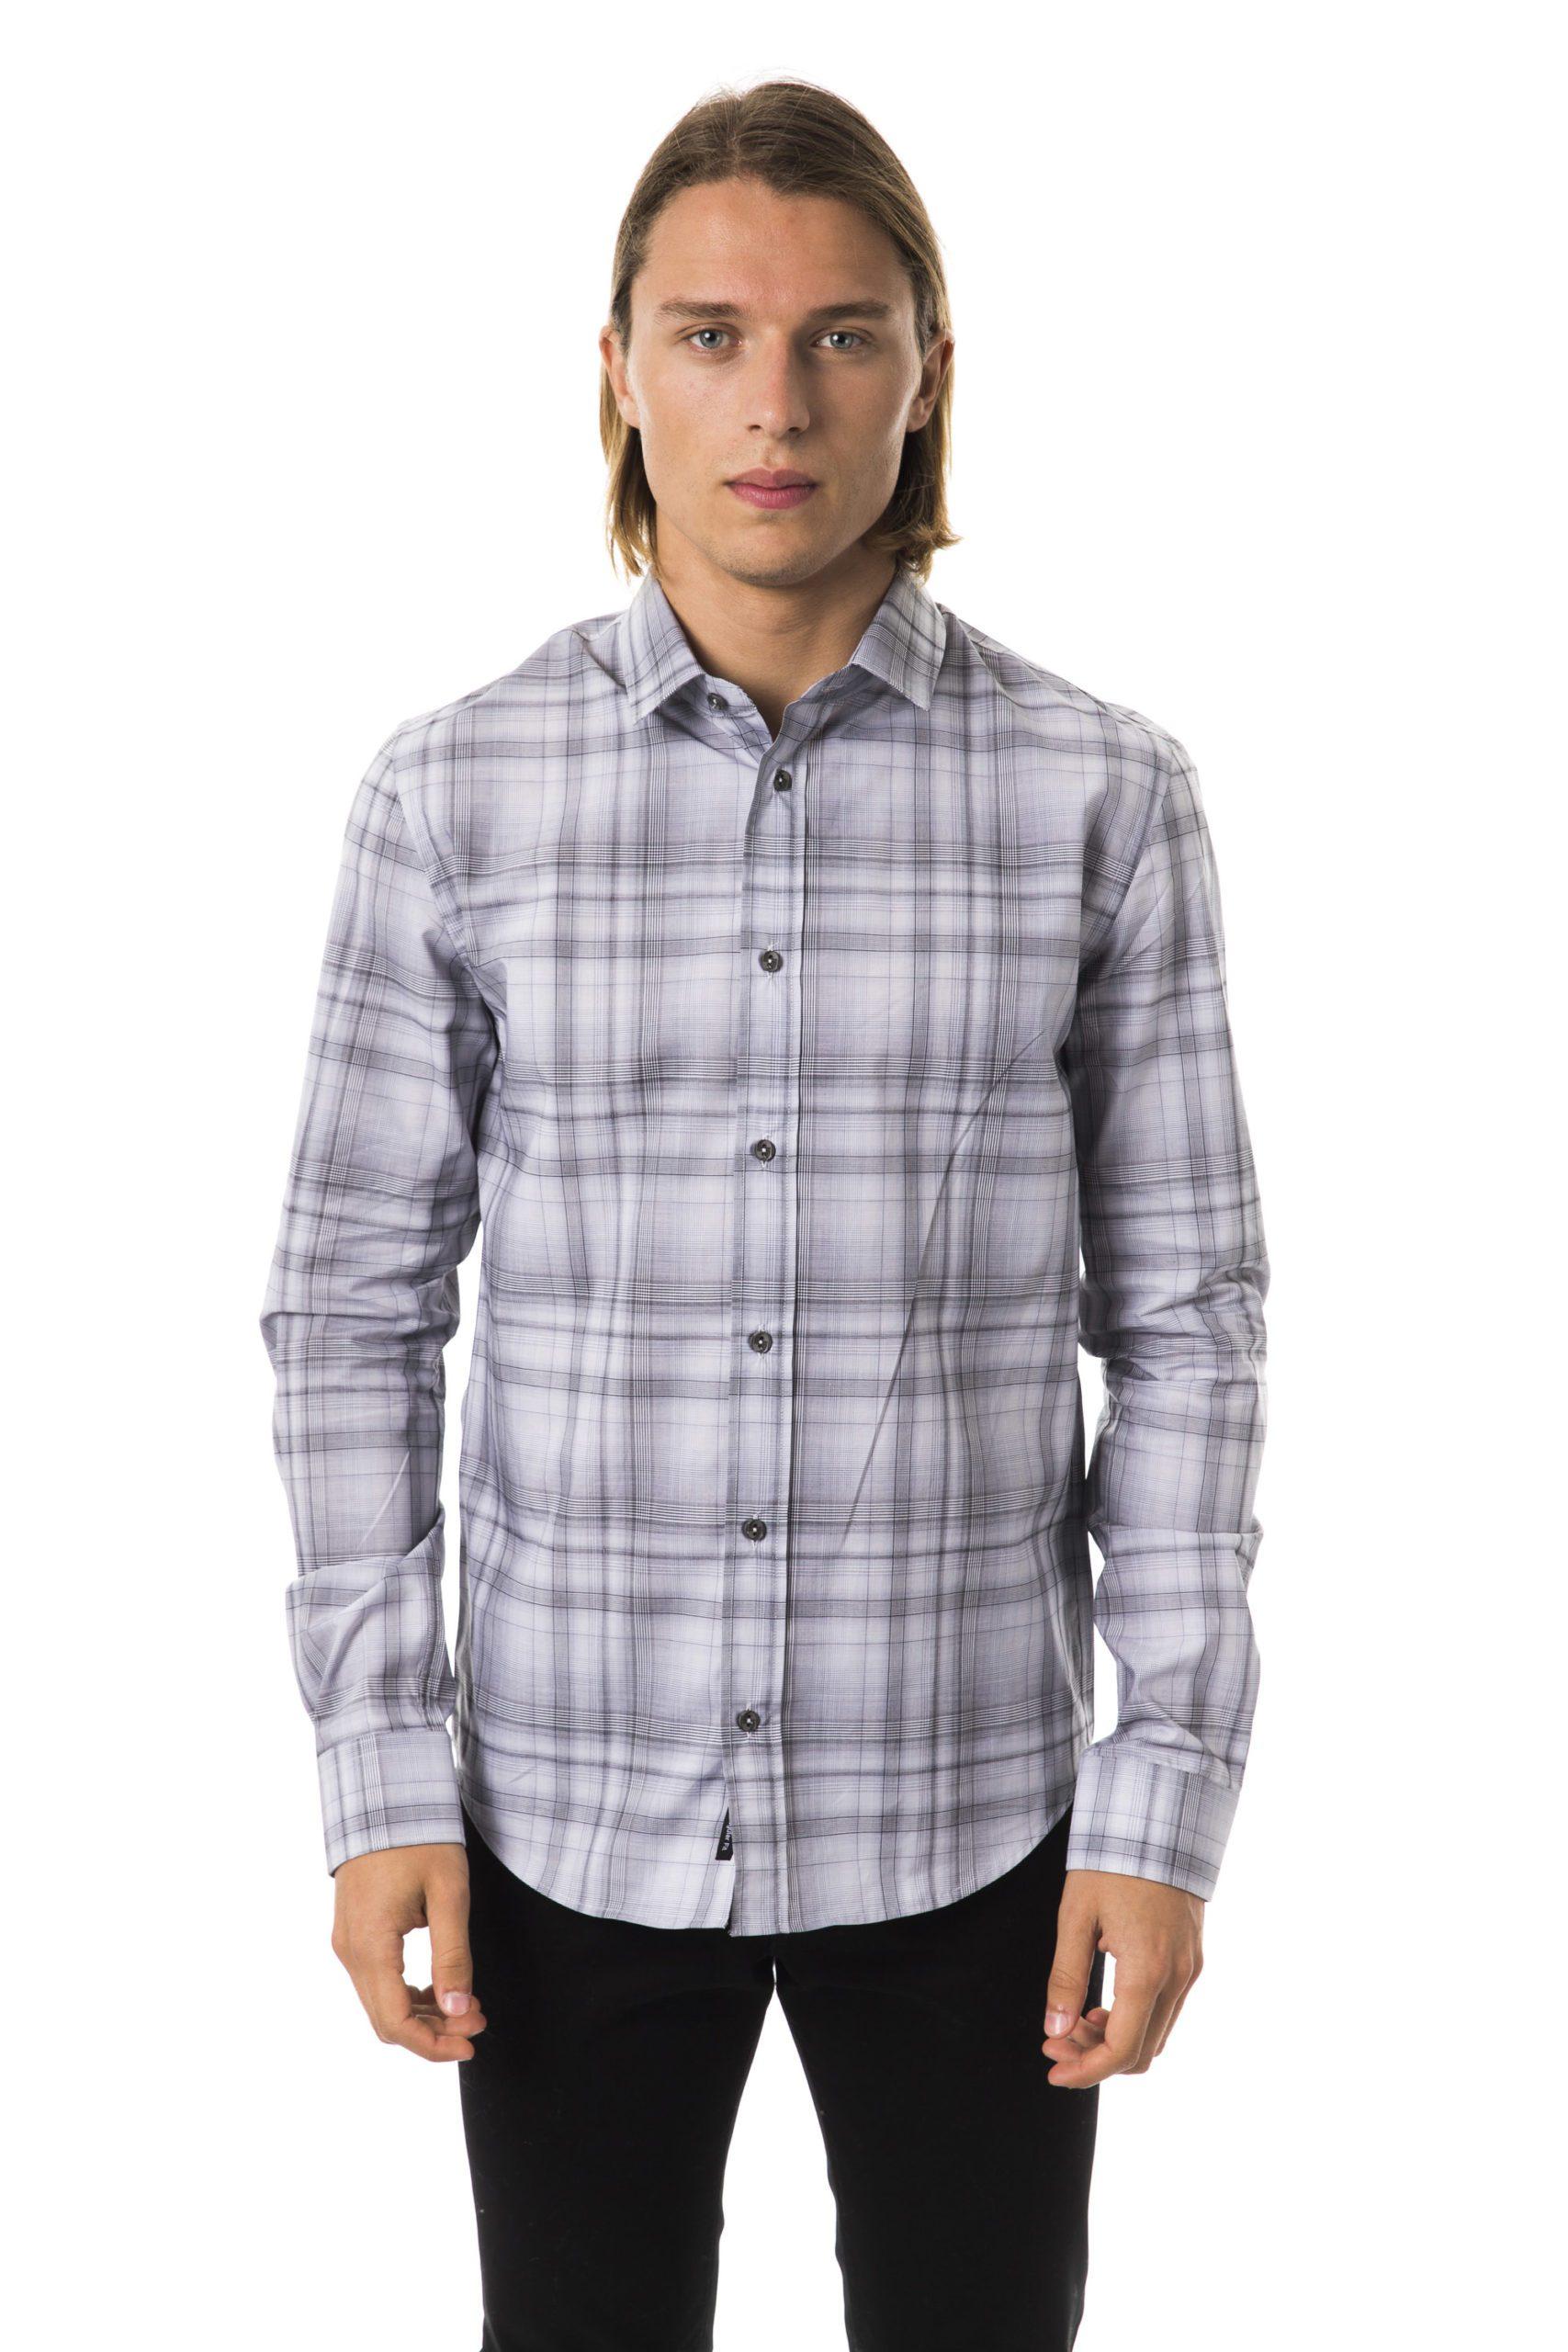 BYBLOS Men's Grigionaturale Shirt Gray BY1394830 - S